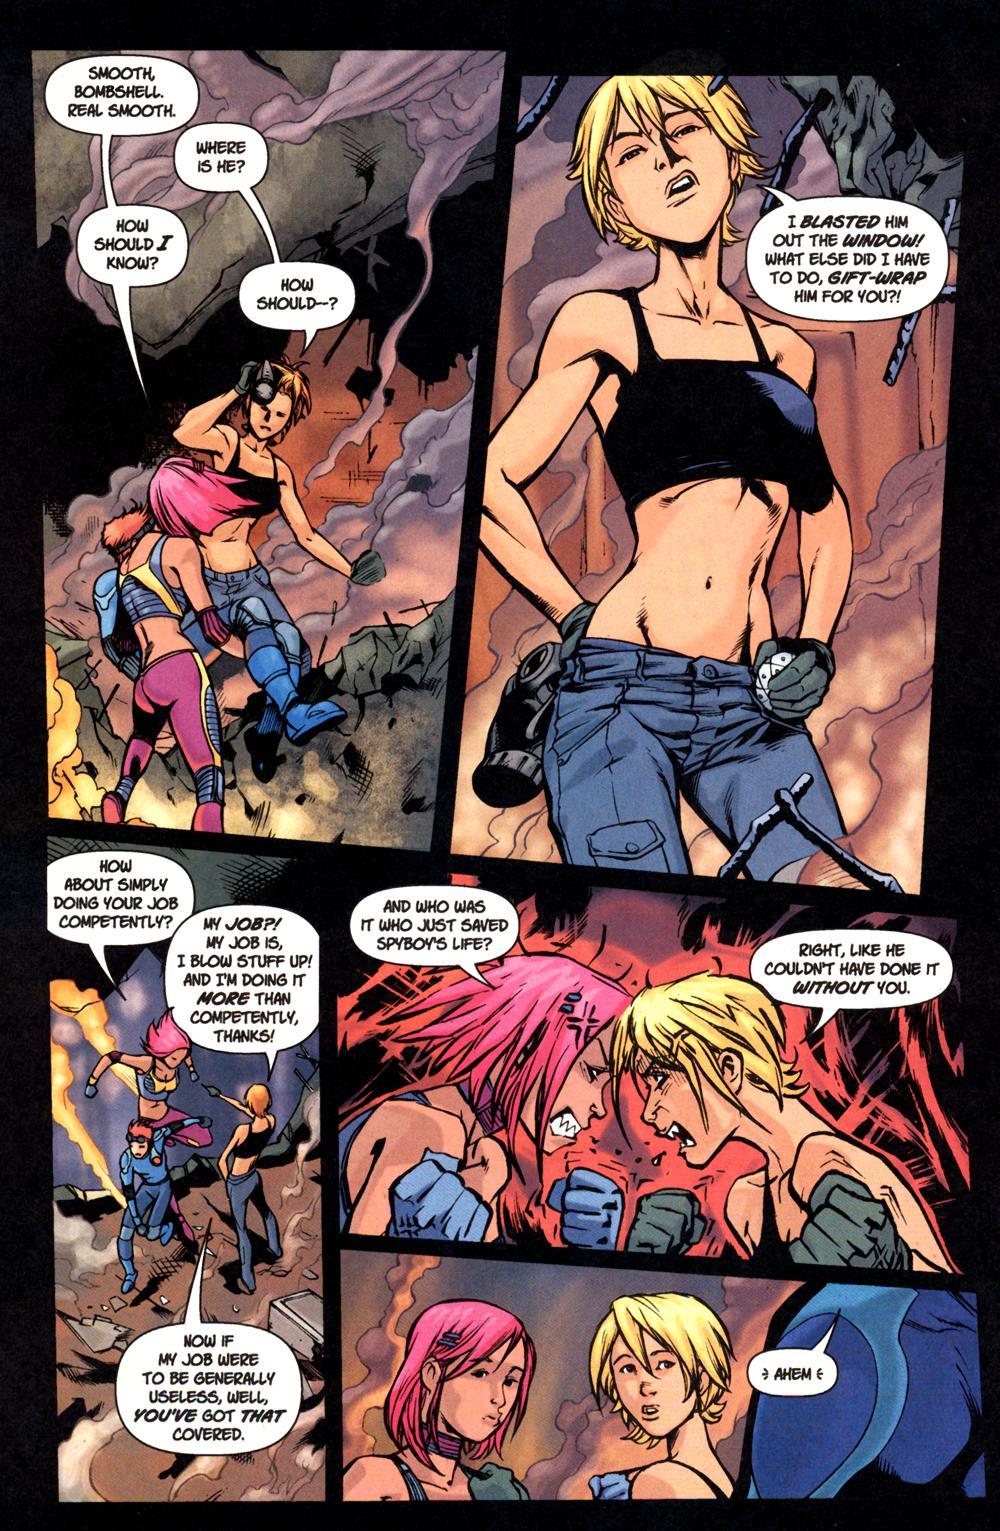 Read online SpyBoy: Final Exam comic -  Issue #1 - 12